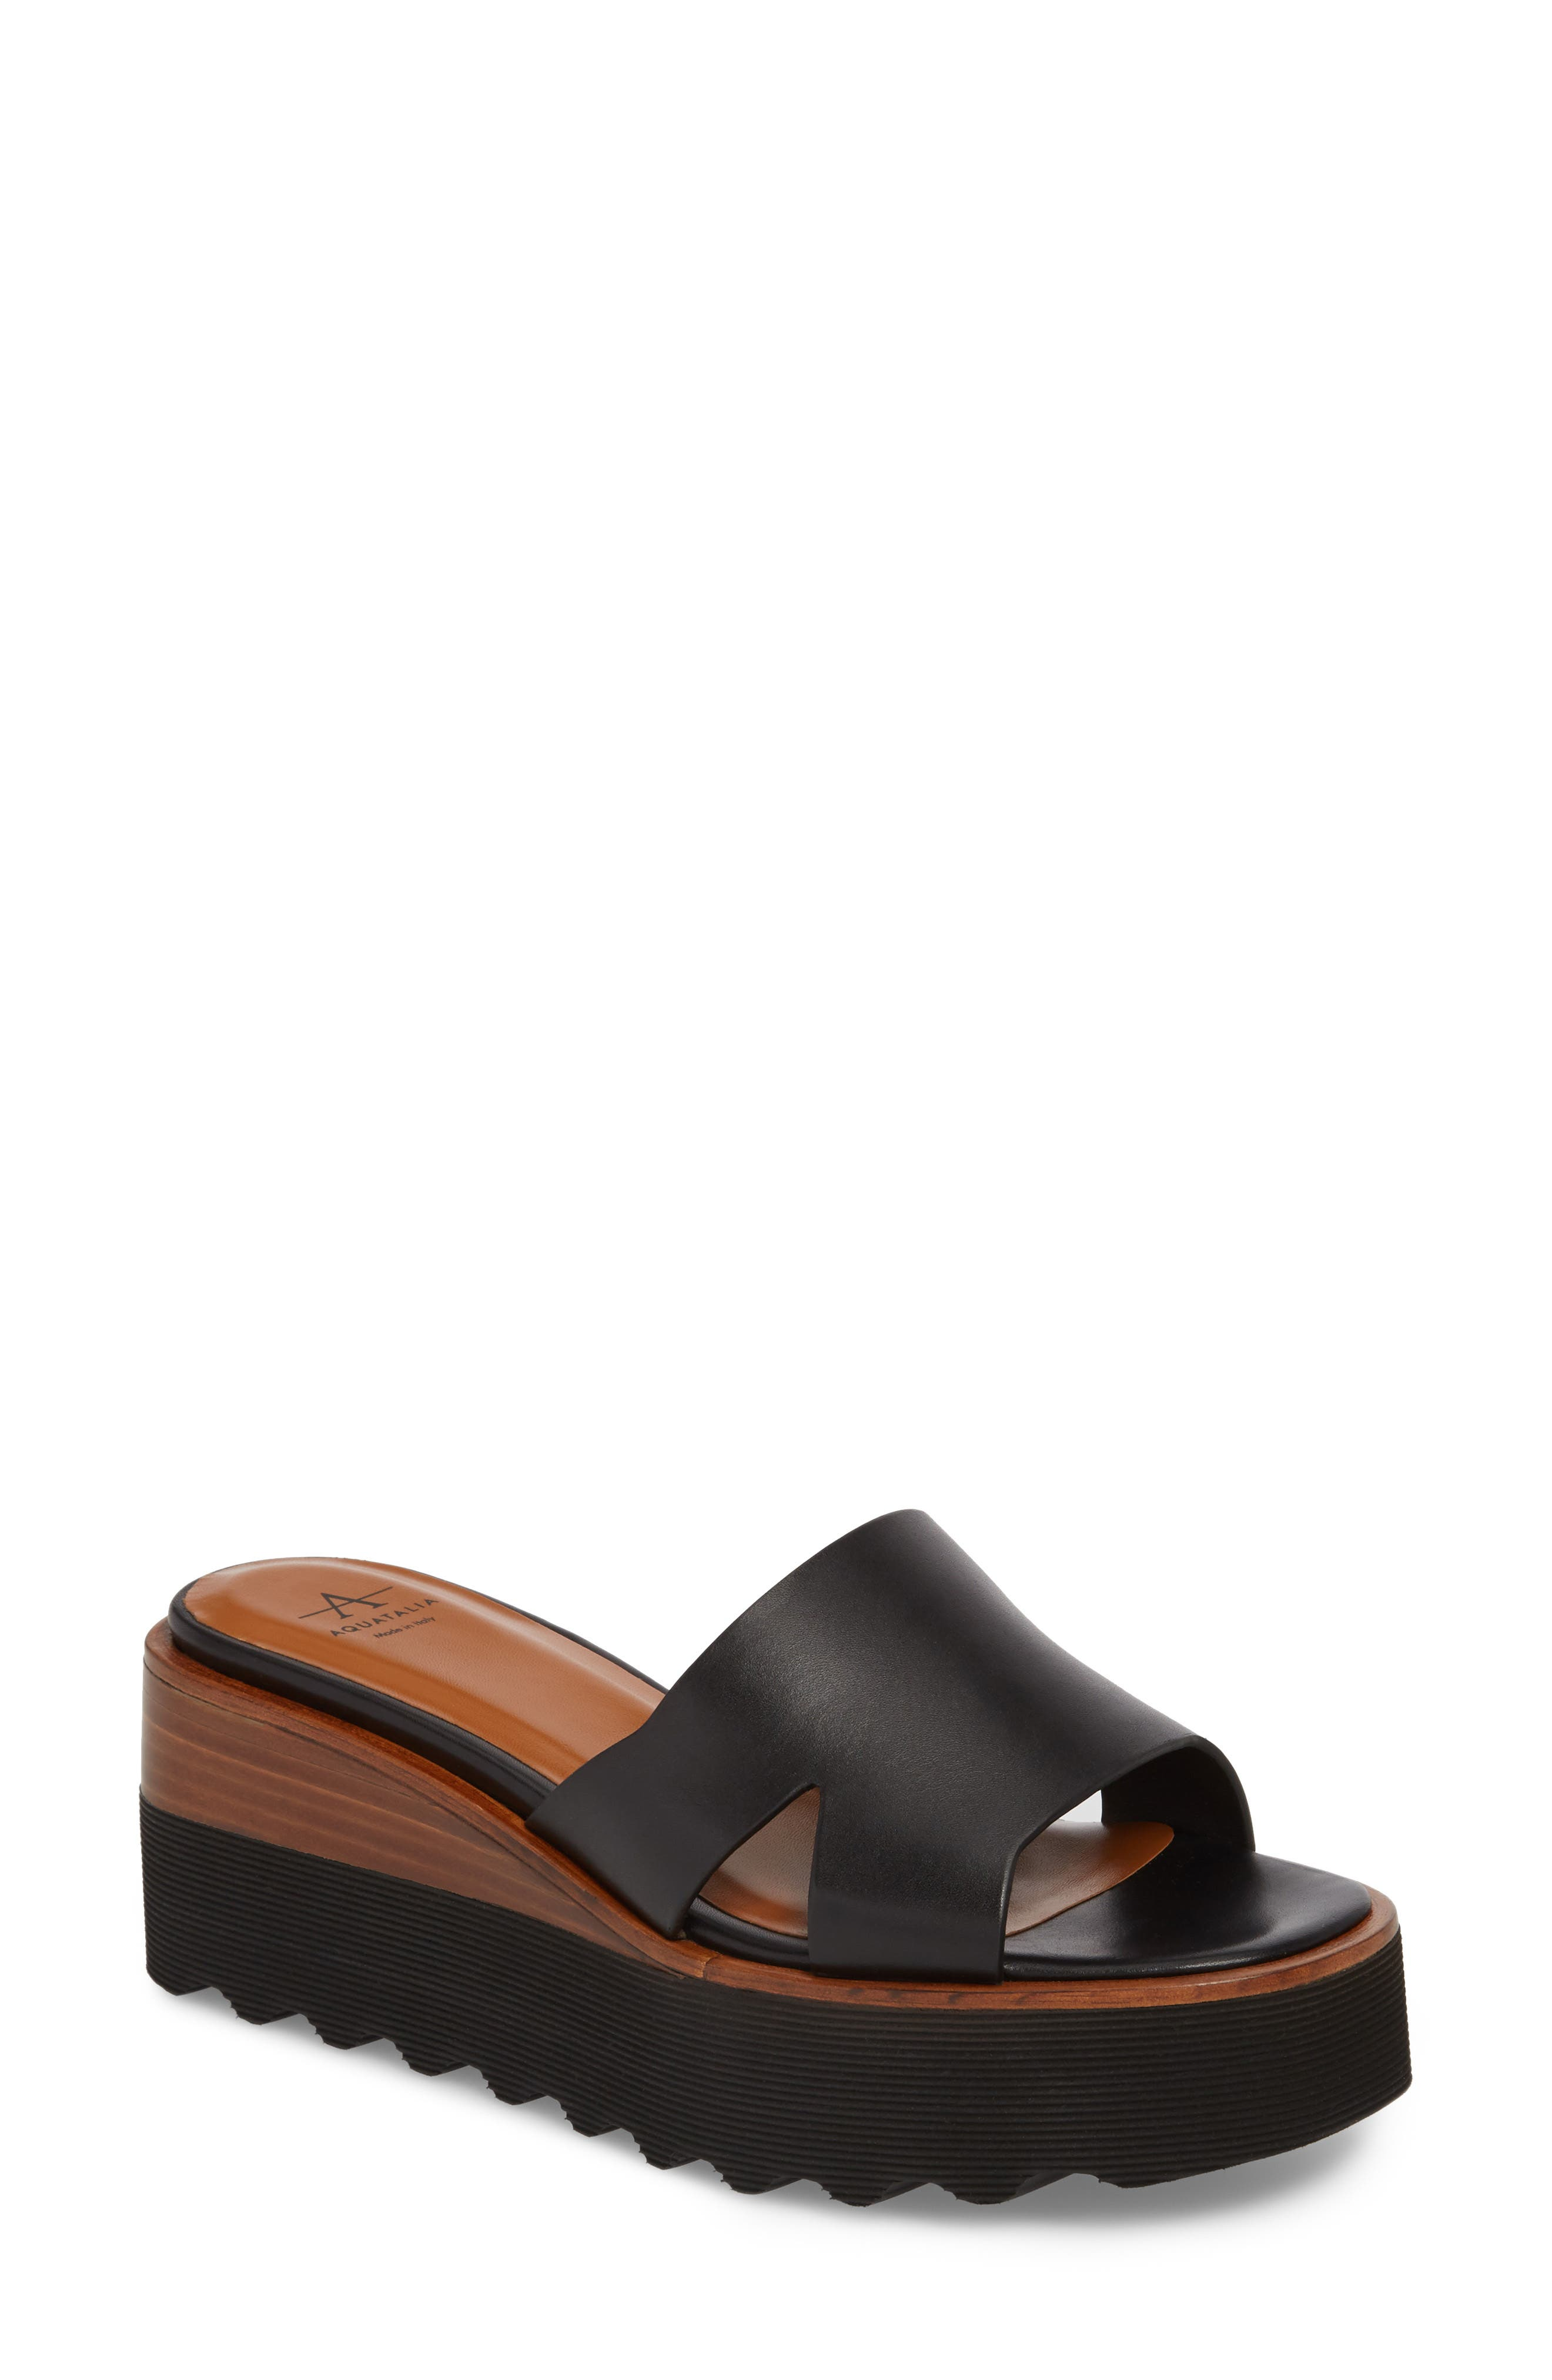 Tayla Platform Wedge Sandal,                             Main thumbnail 1, color,                             001